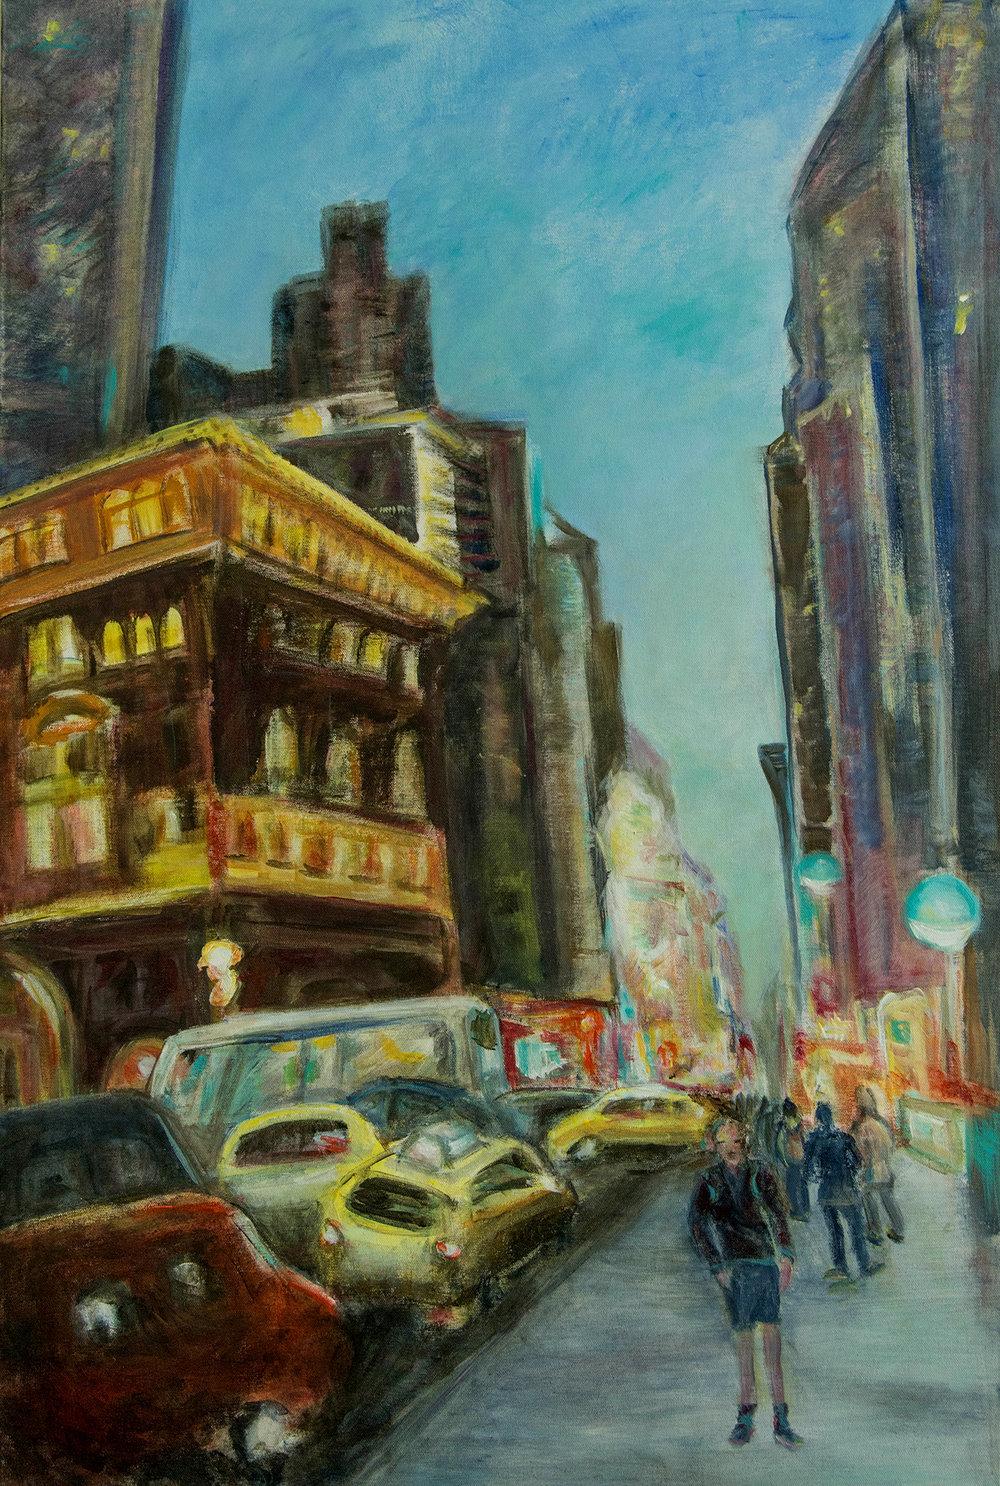 Down 7th Avenue, acrylic on canvas, 24 x 36, Rachel Lulov 2018